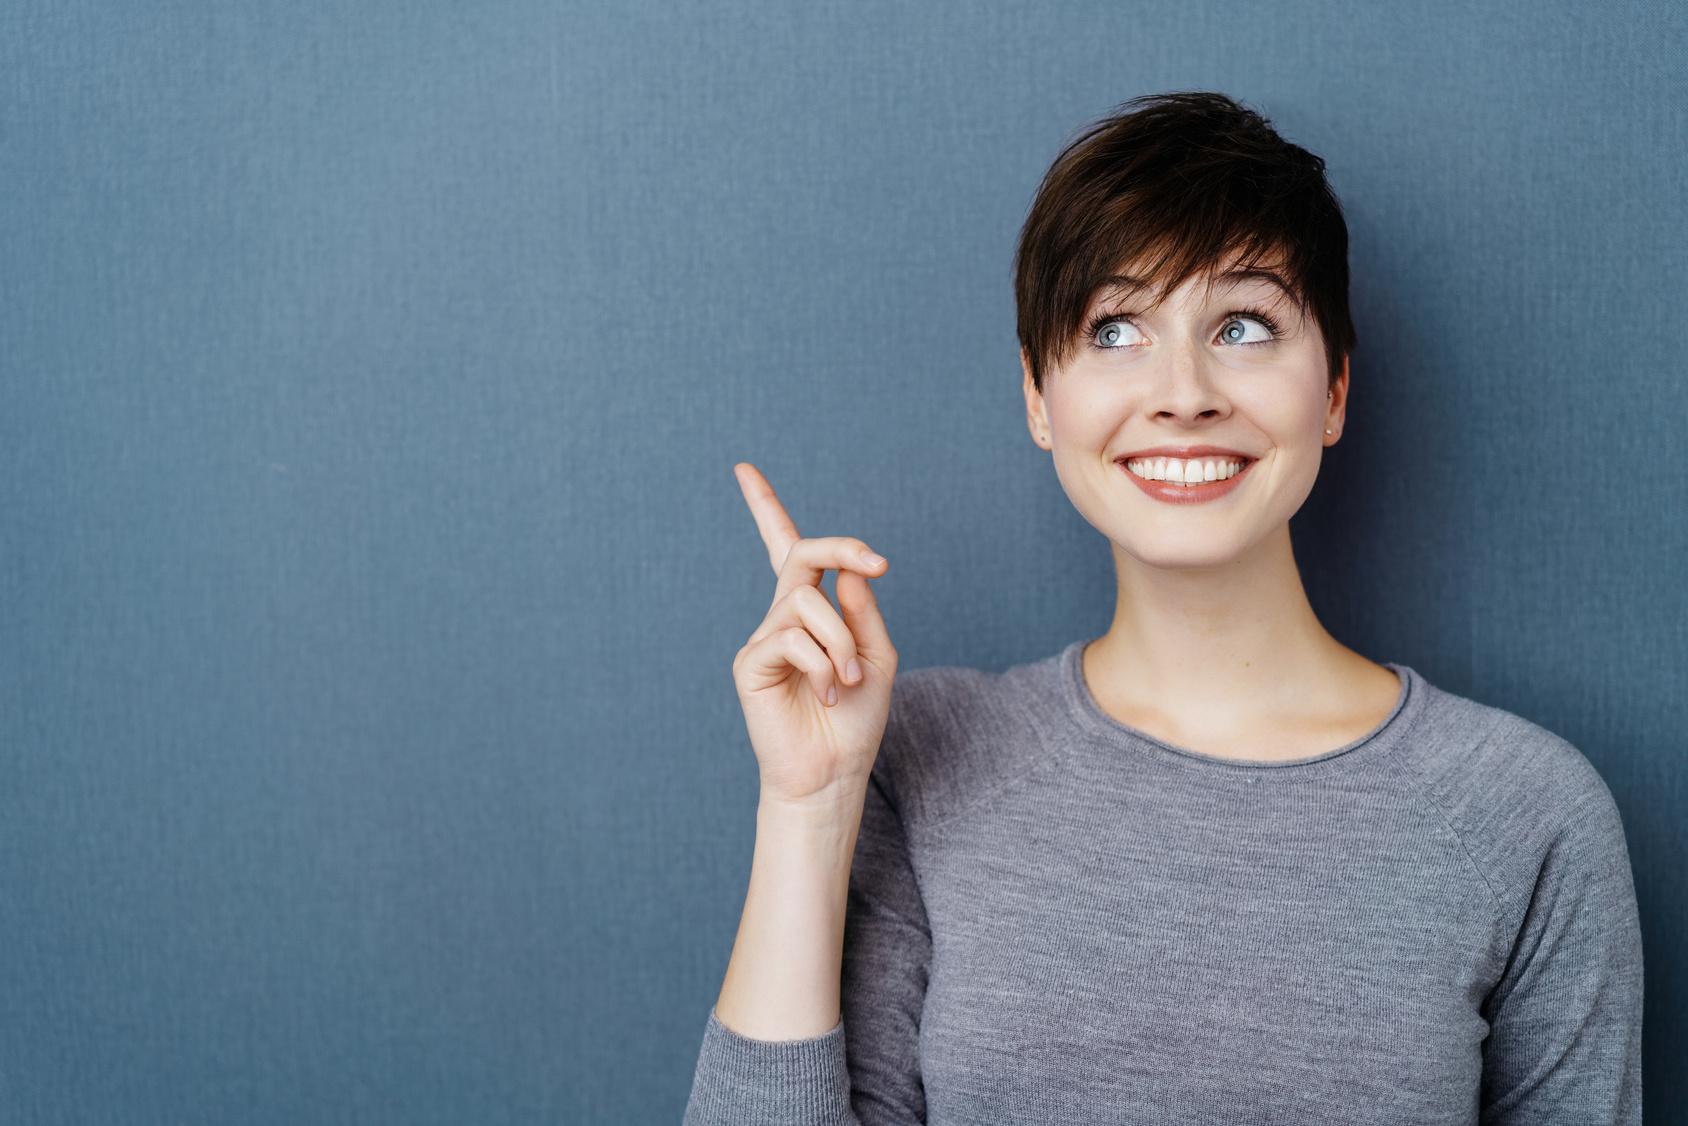 Cheerful new female teacher pointing upwards